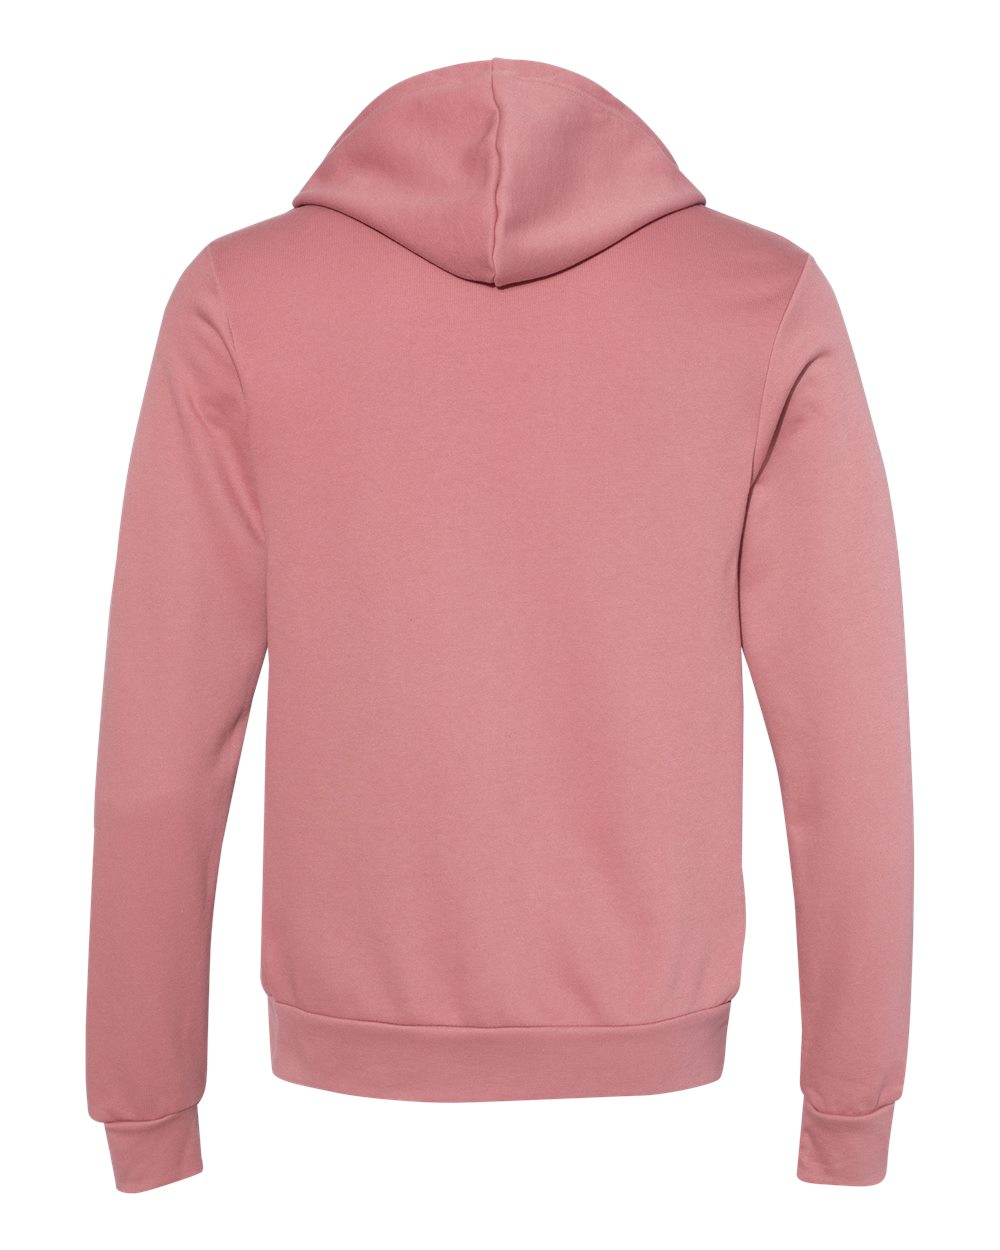 Bella-Canvas-Unisex-Sponge-Hooded-Pullover-Sweatshirt-Blank-3719-up-to-2XL thumbnail 75